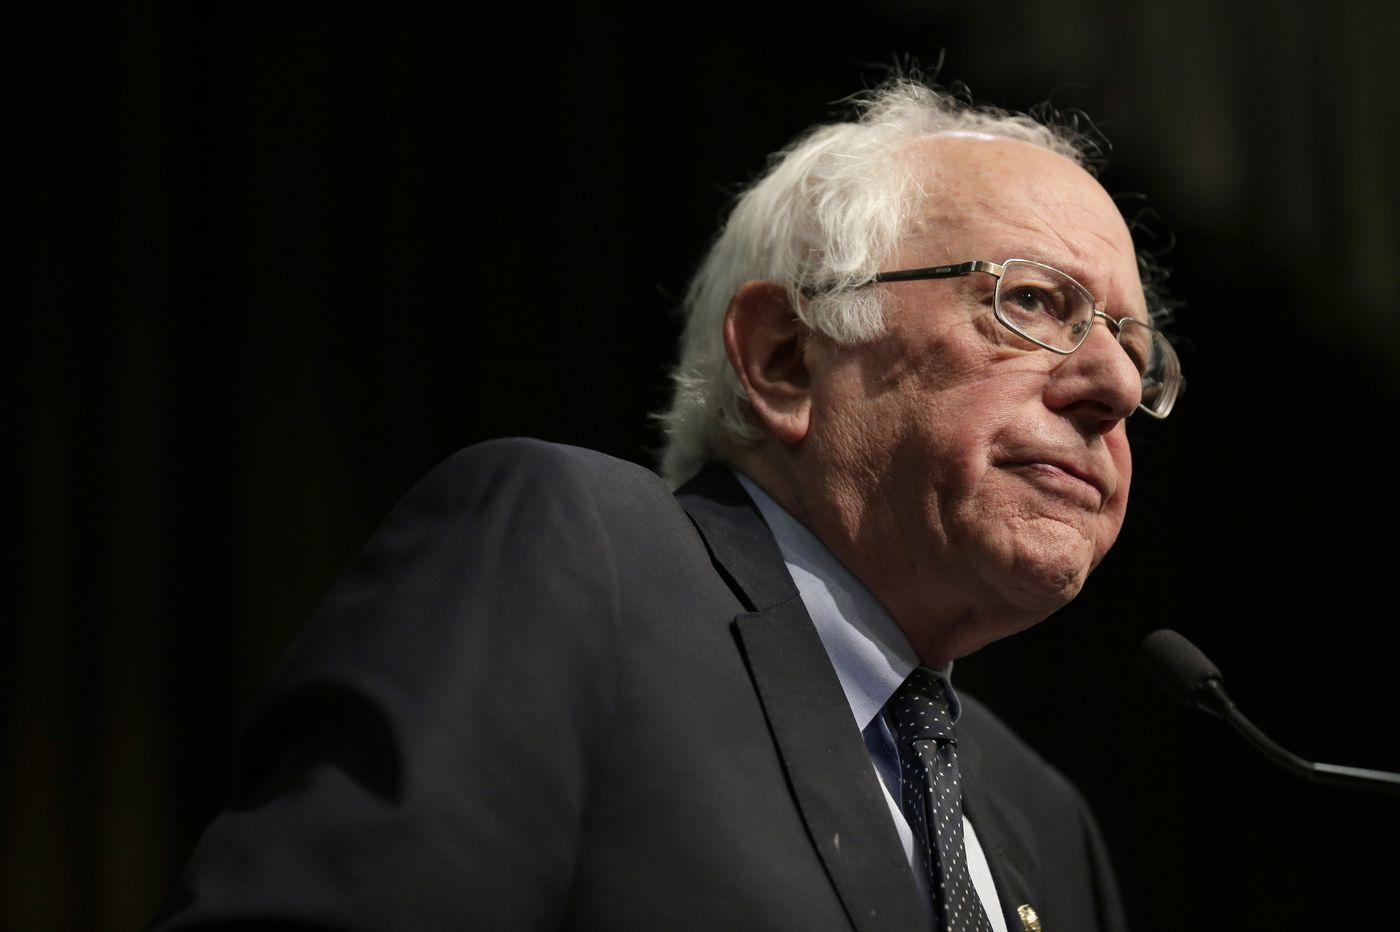 Bernie Sanders to visit Pa. on weekend swing through battleground industrial states